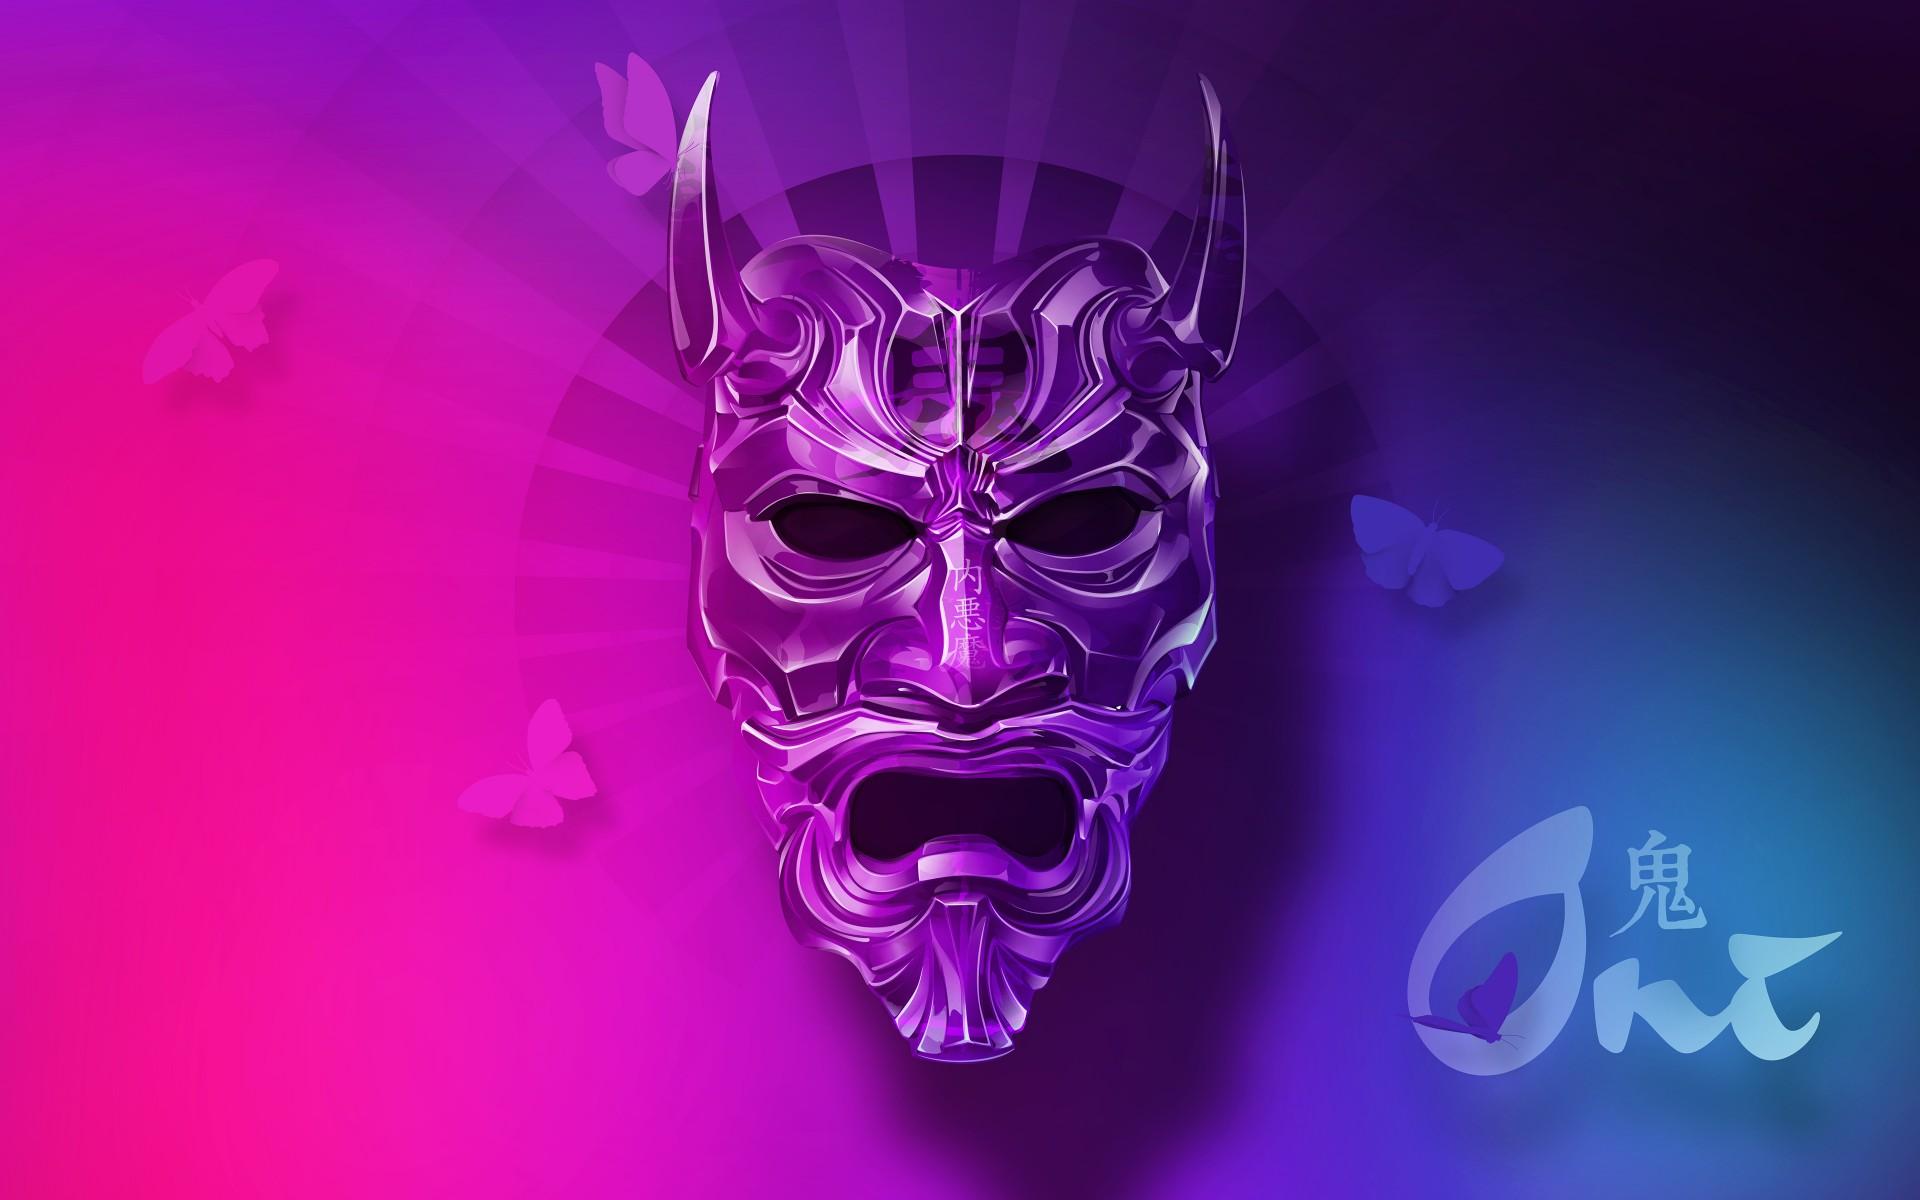 The Shield Hd Wallpaper Download Oni Mask 4k Wallpapers Hd Wallpapers Id 21913